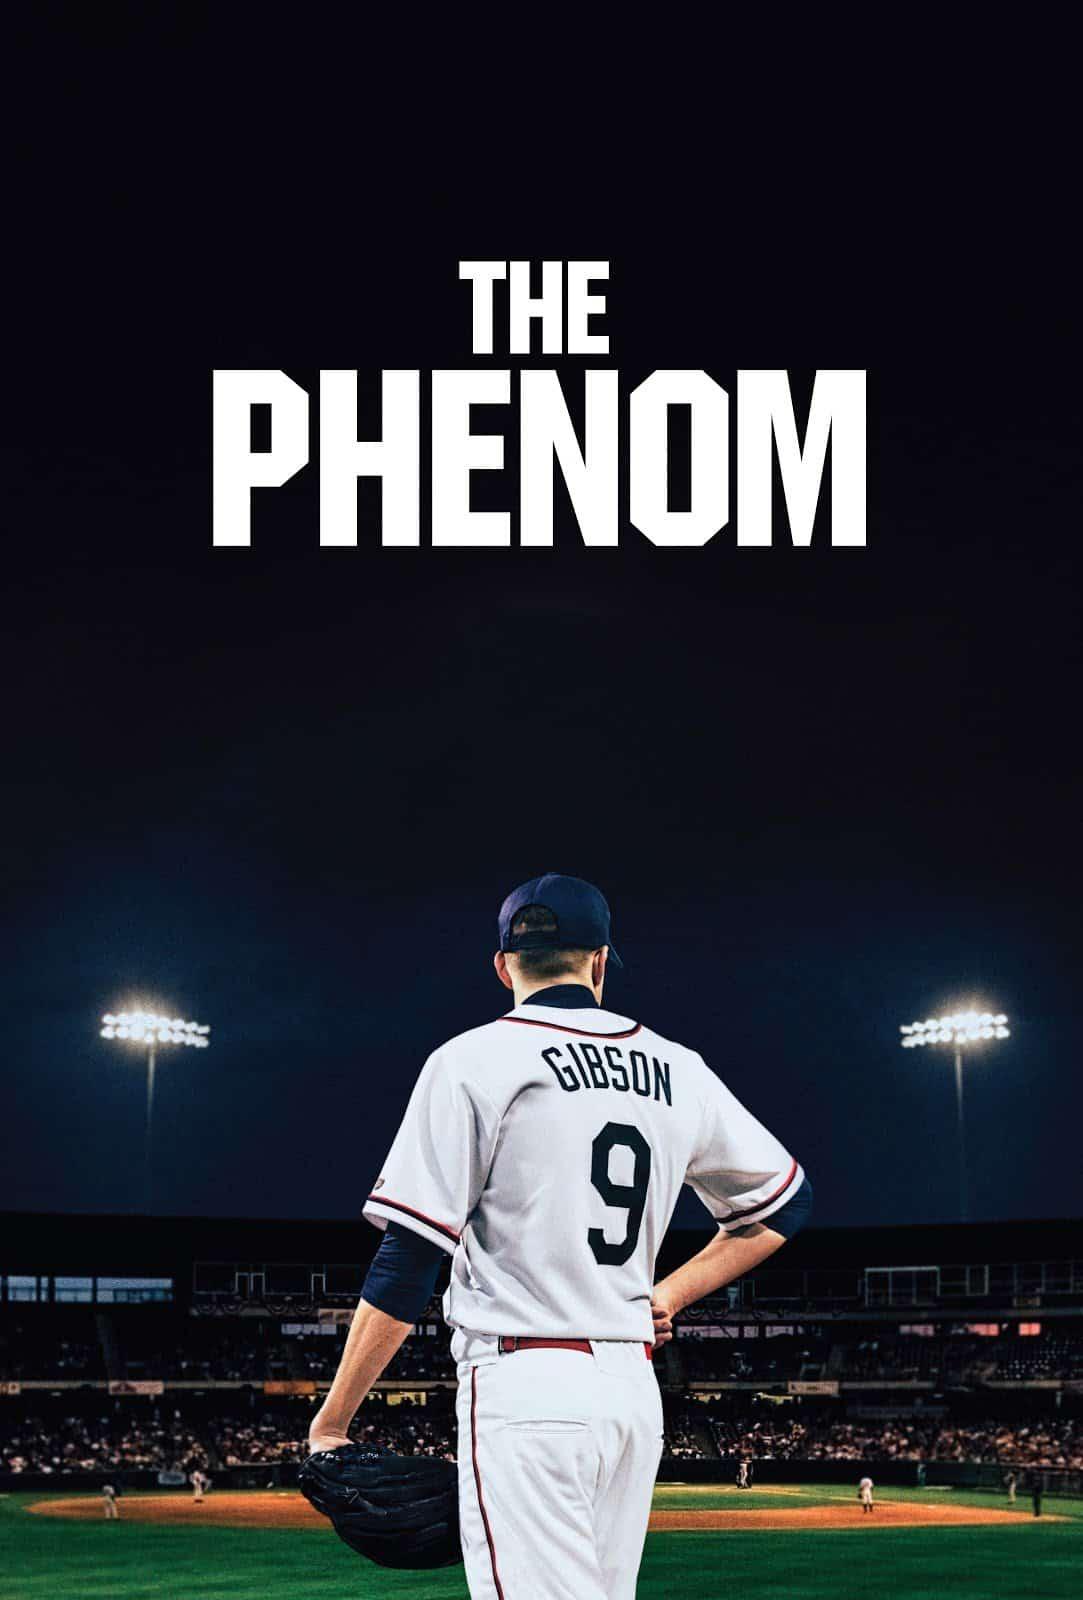 The Phenom, 2016